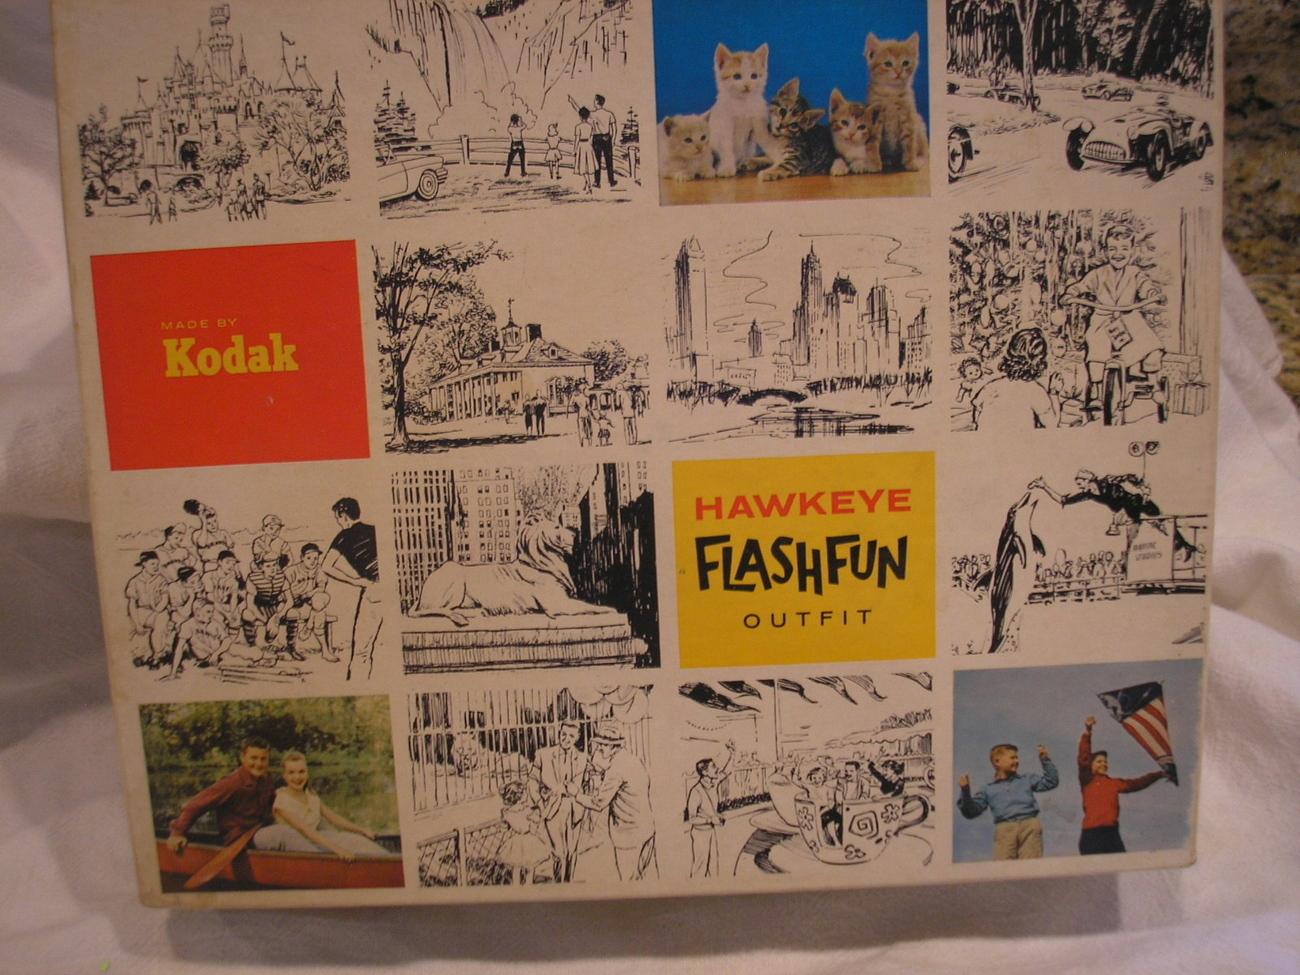 Antique Vintage 1950's  HAWKEYE FLASHFUN OUTFIT IN ORIGINAL BOX No. 22K